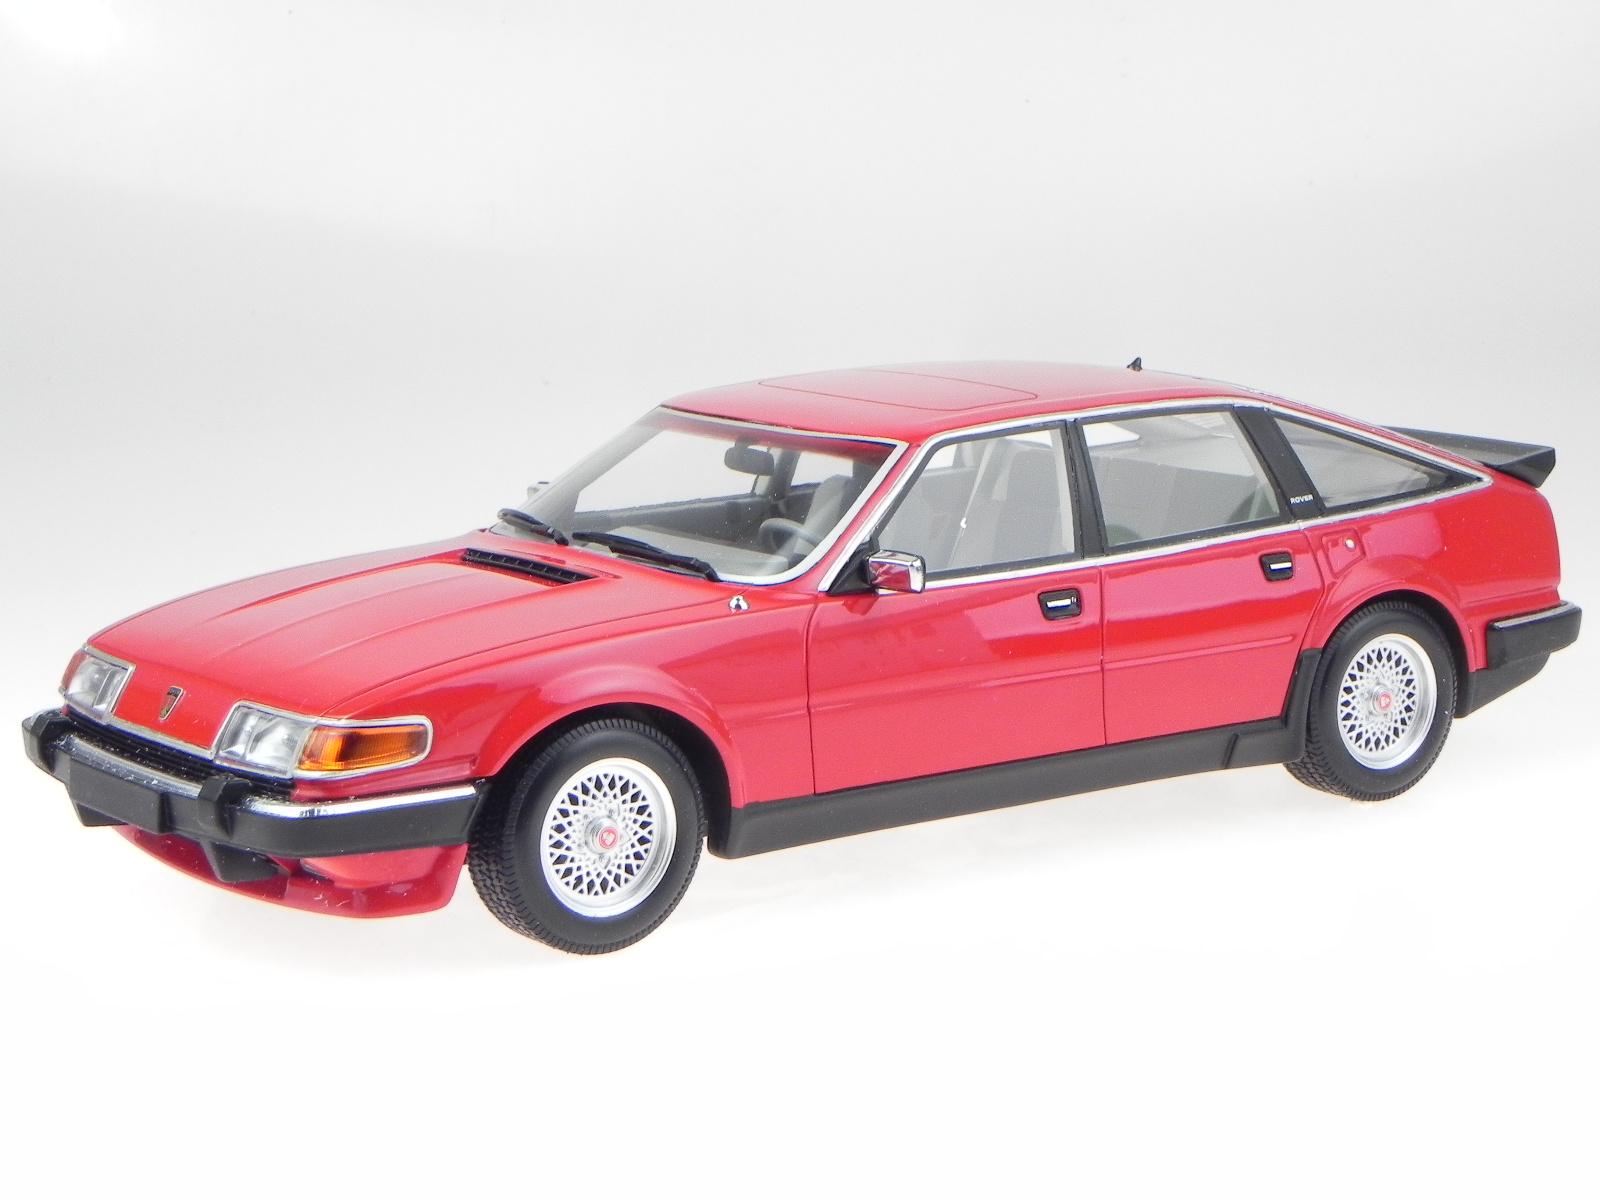 Rover Vitesse Vitesse Vitesse 3.5 V8 1986 rouge véhicule miniature 107138401 Minichamps 1:18 | Magasiner  66a961